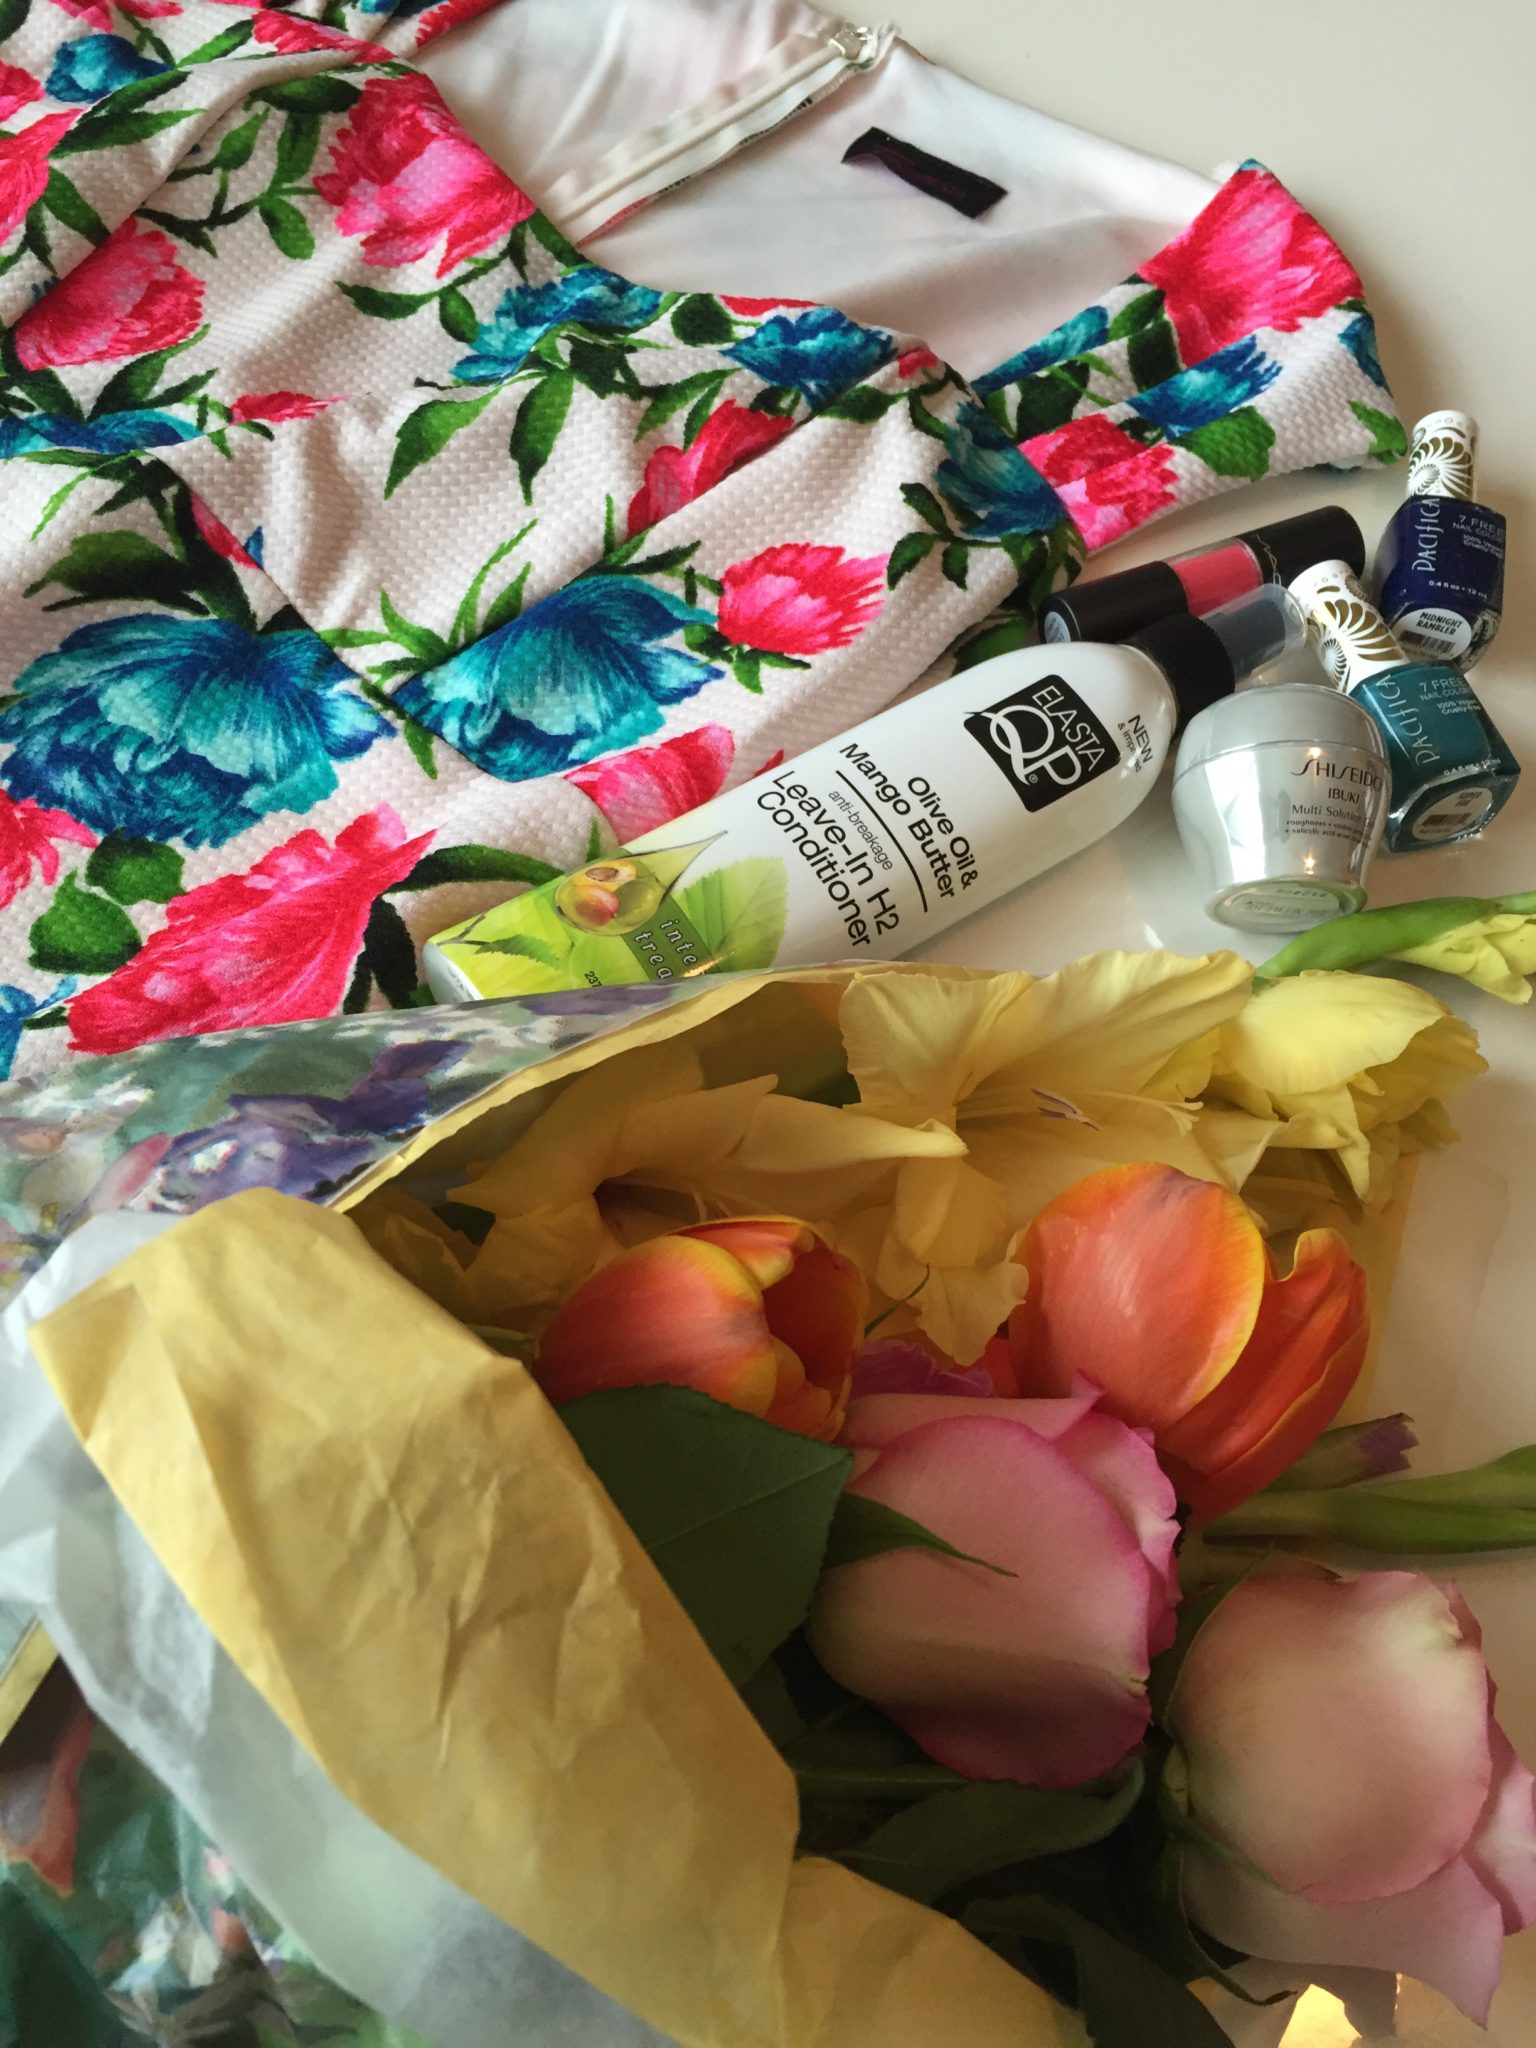 Pinktastic Saturday: My Favorite Spring Essentials!